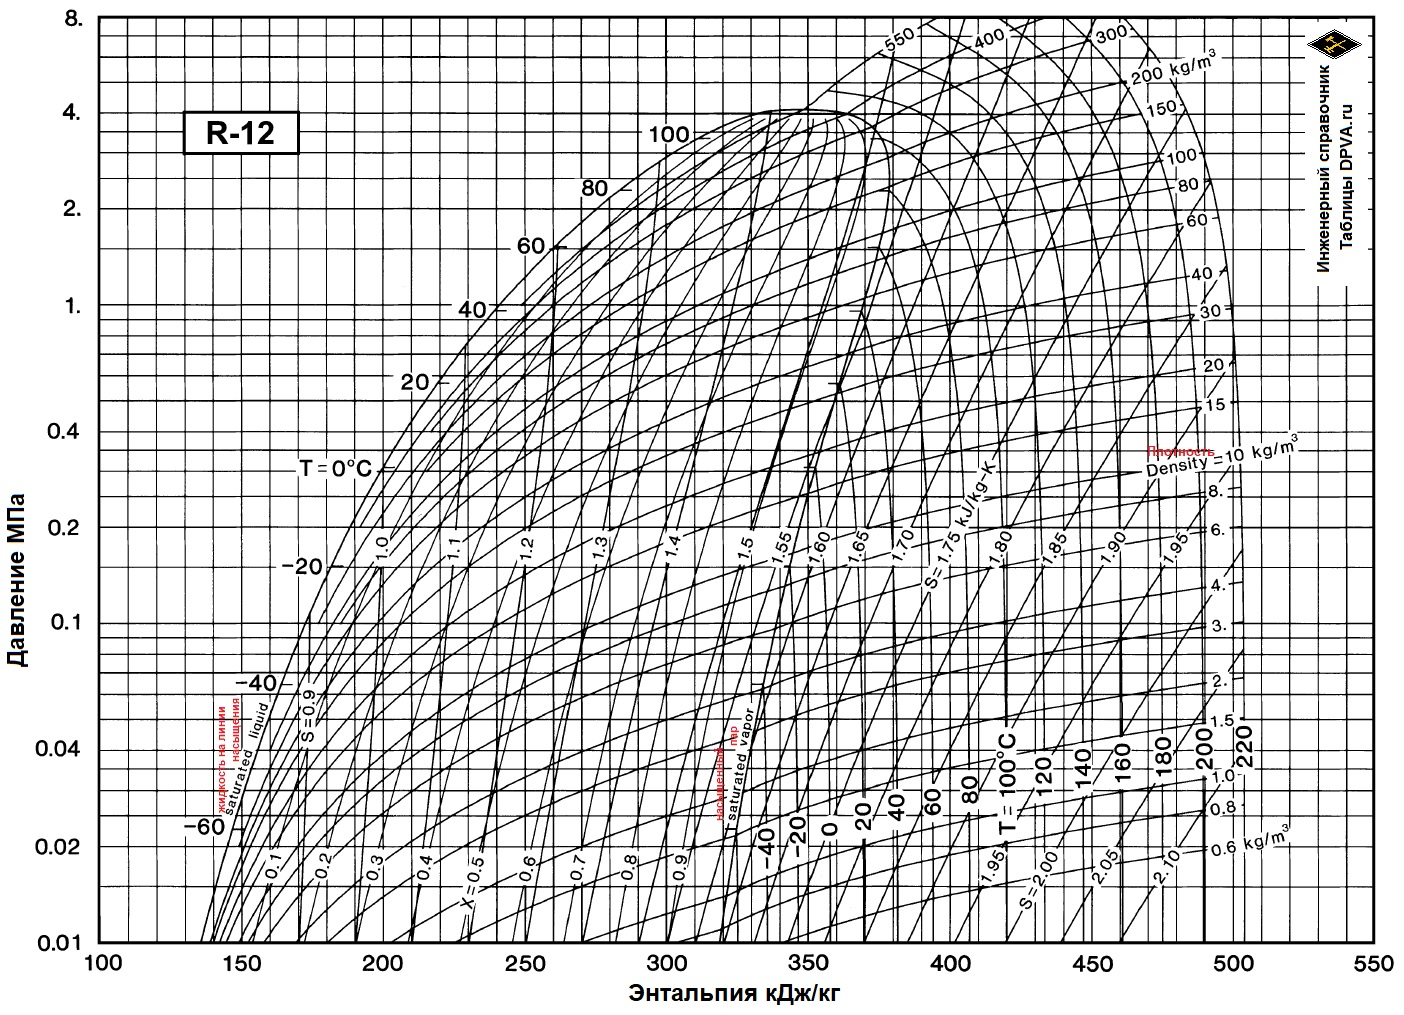 Хладагент, фреон, хладон (Холодильный агент) R12 - Дифтордихлорметан = Dichlorodifluoromethane (CF2CCl2) Диаграмма Давление/Энтальпия/Температура